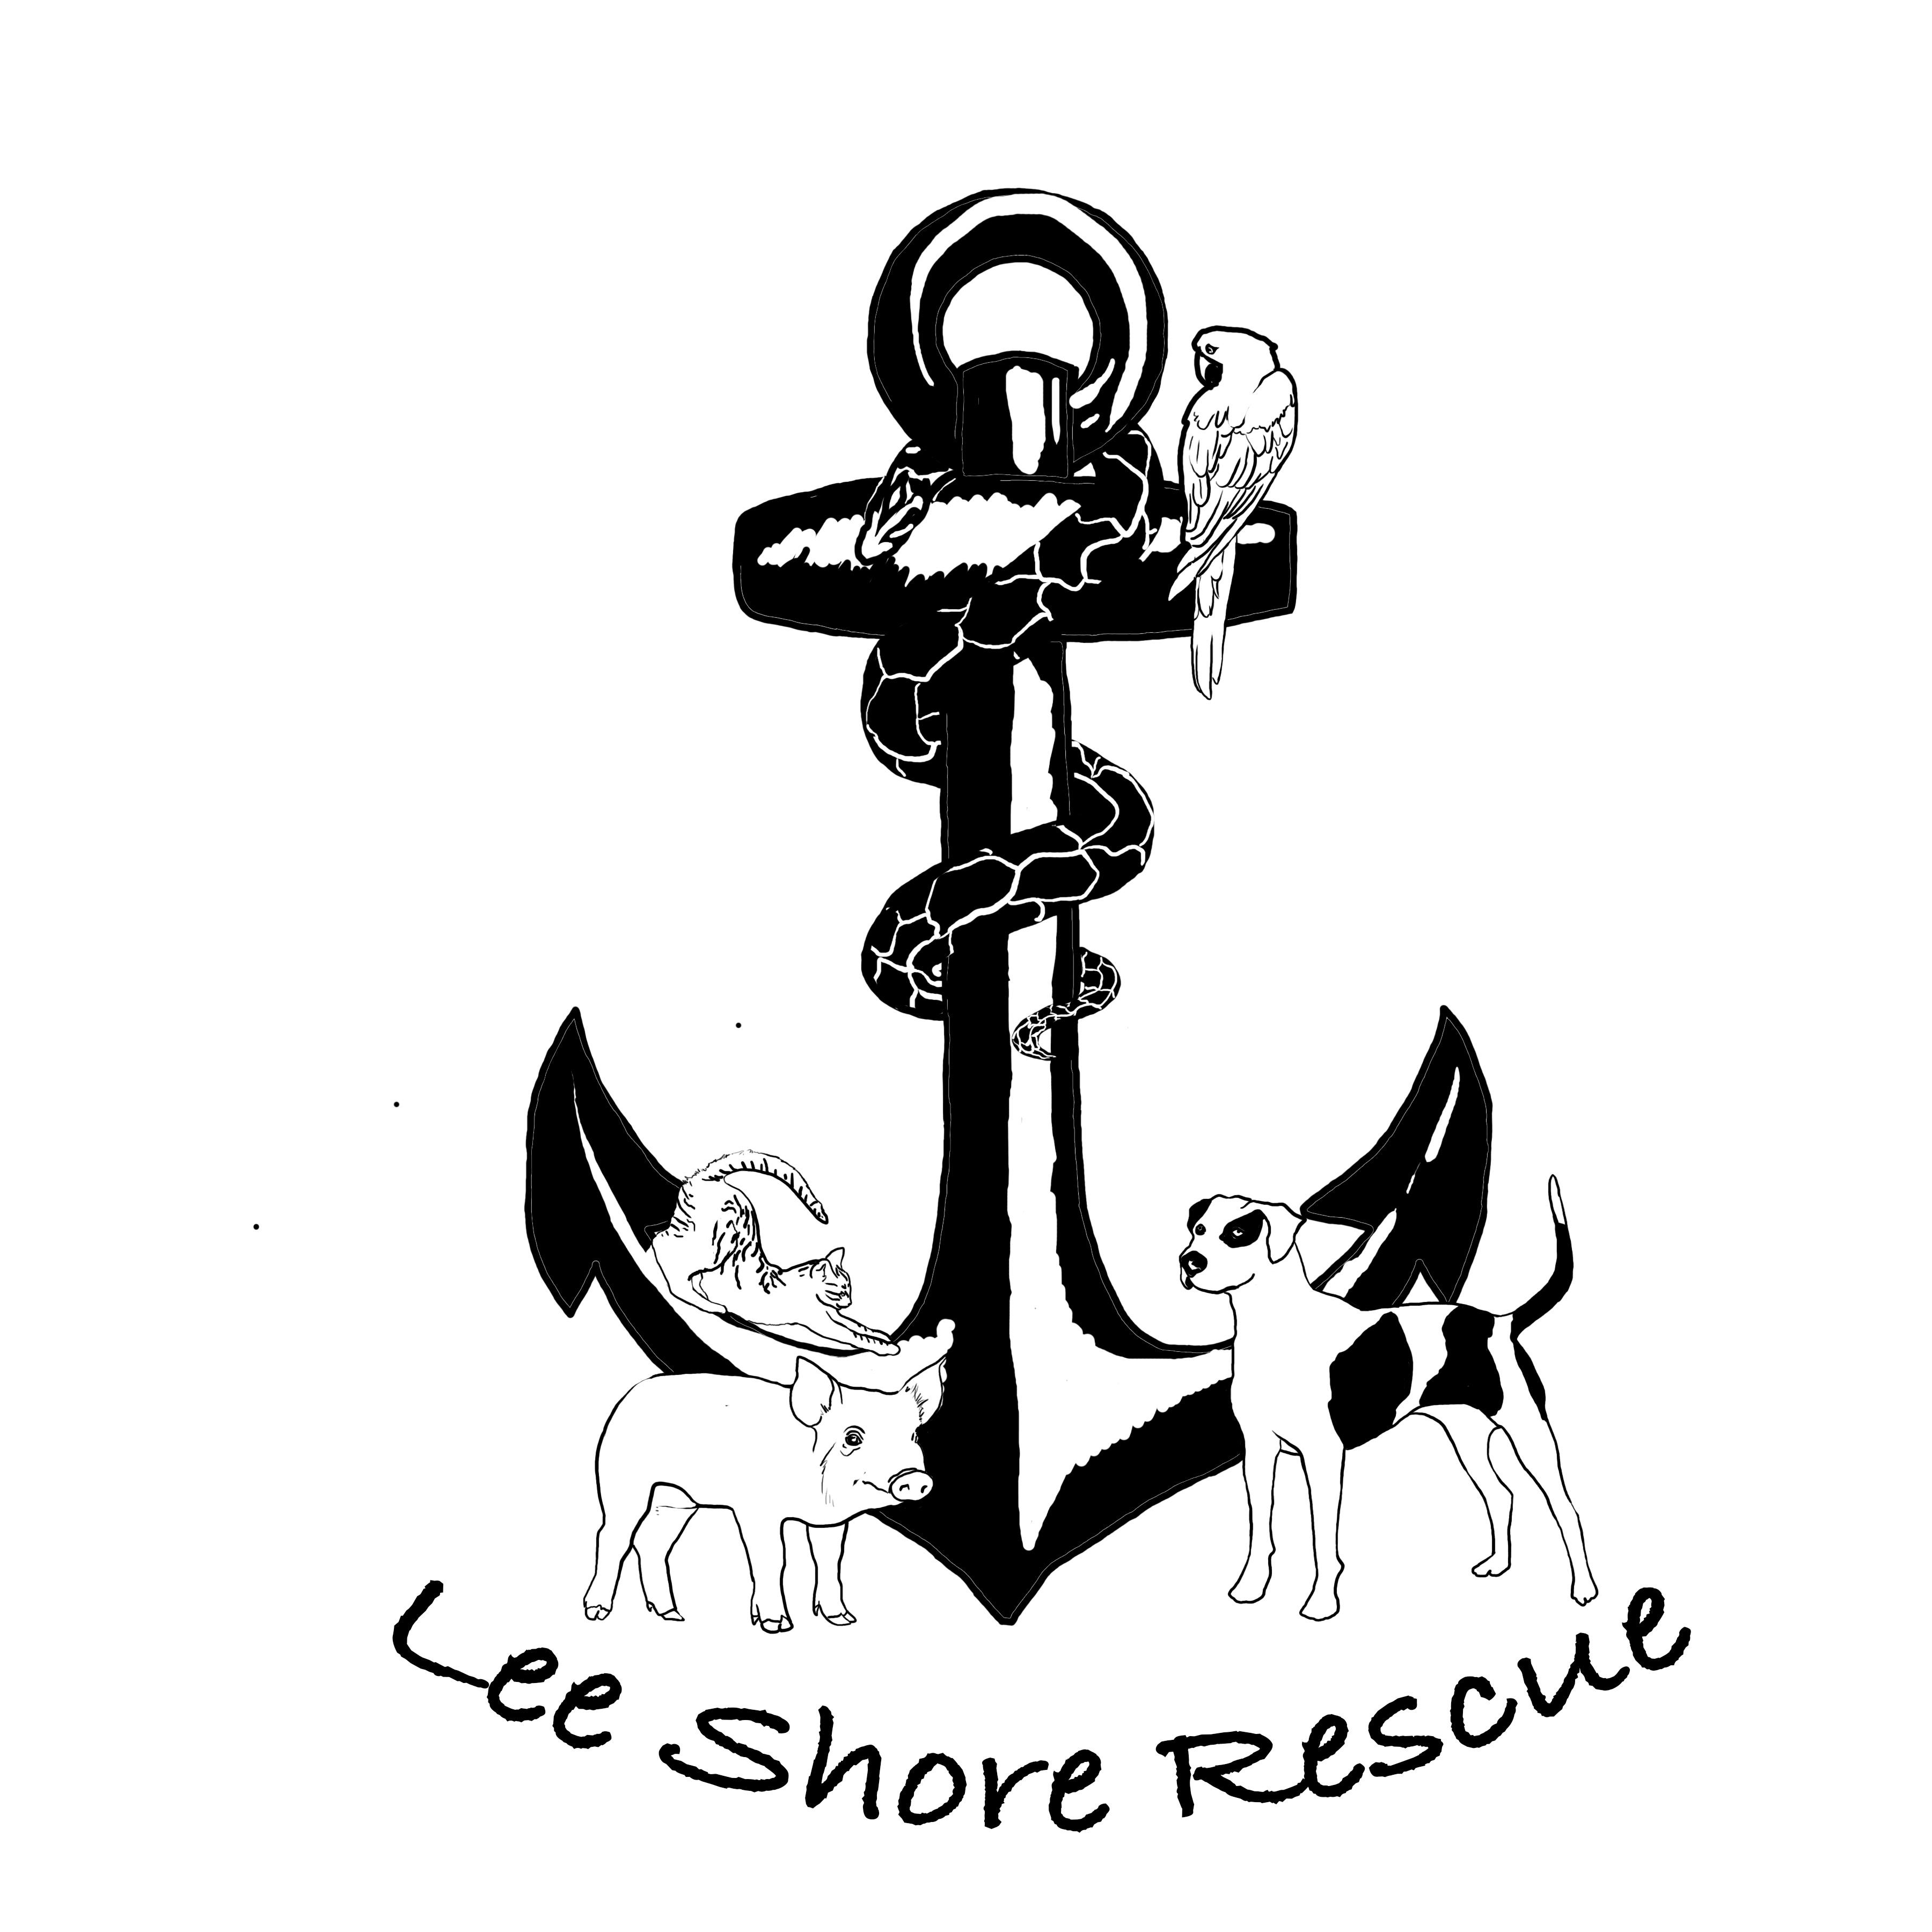 Lee Shore Rescue, Inc